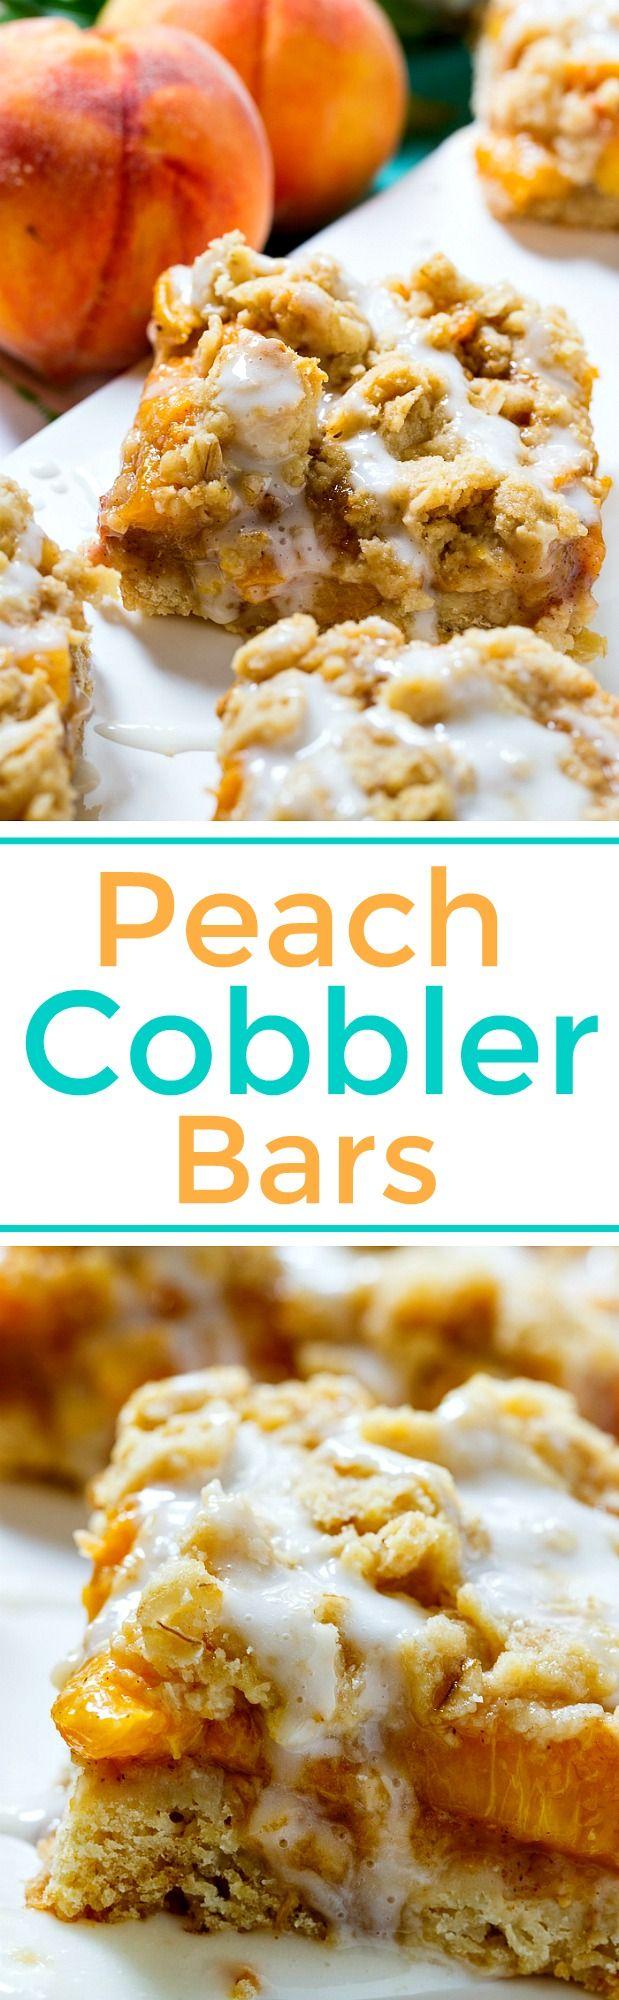 Peach Cobbler Bars taste like peach cobbler in bar form. Great for summer potlucks and picnics.